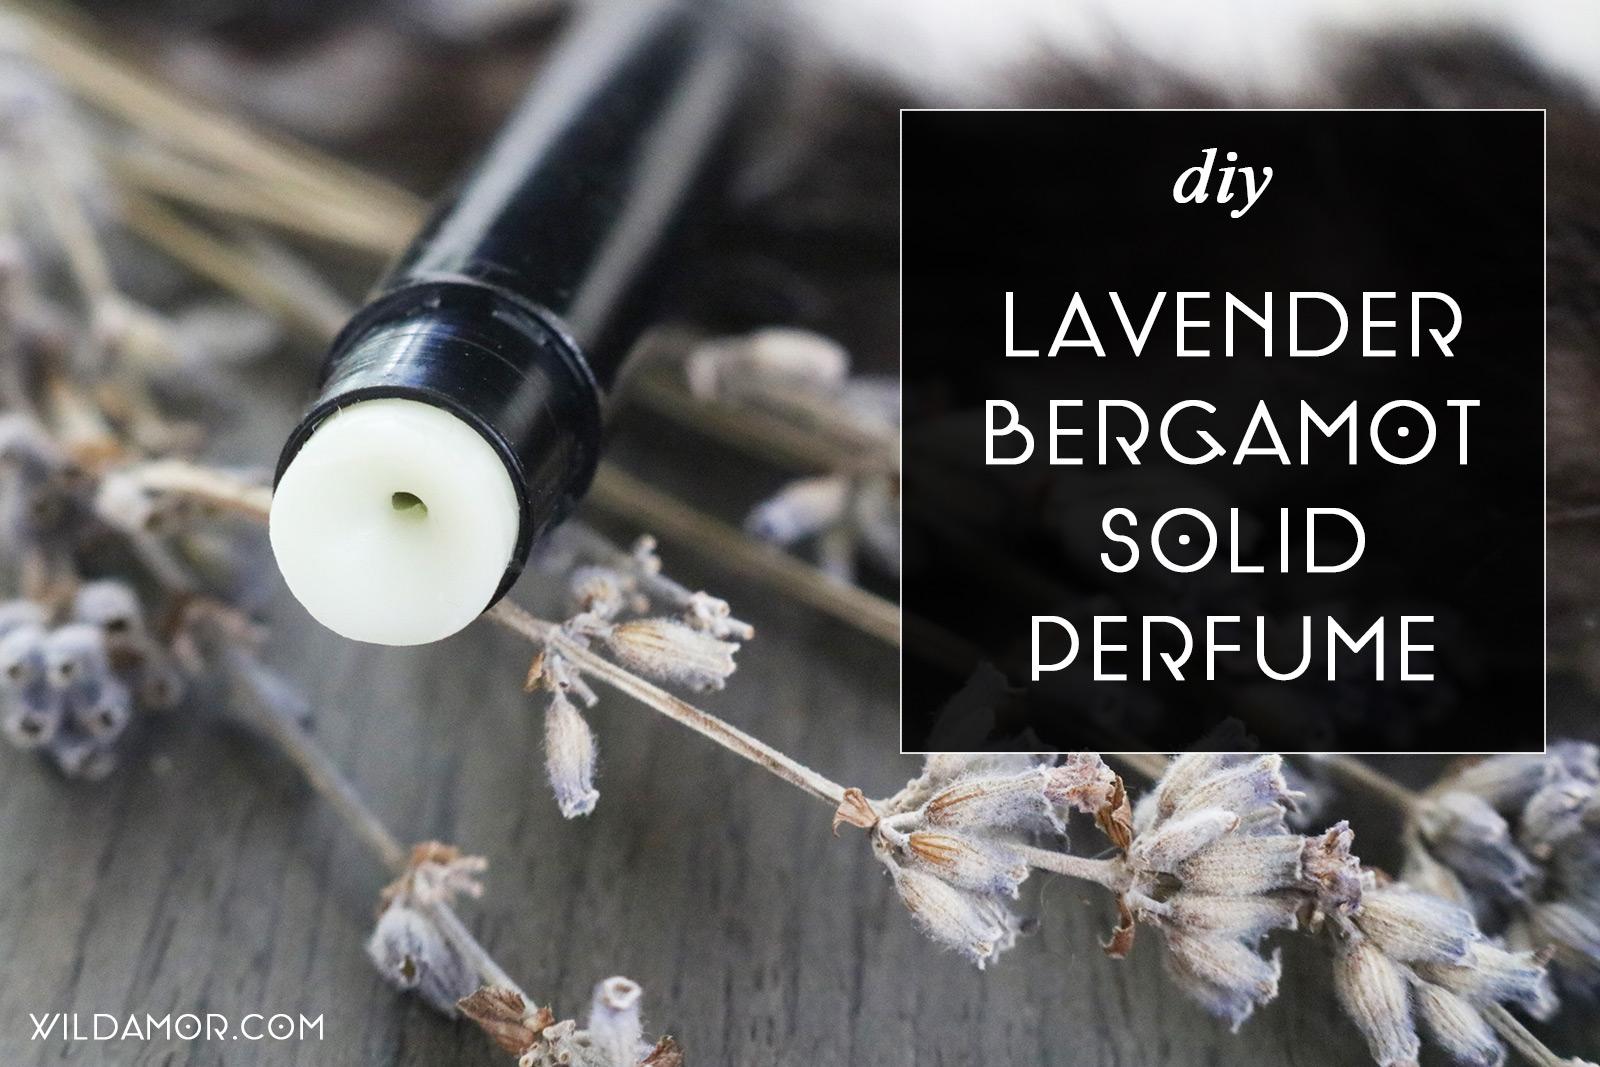 Lavender Bergamot Solid Perfume DIY